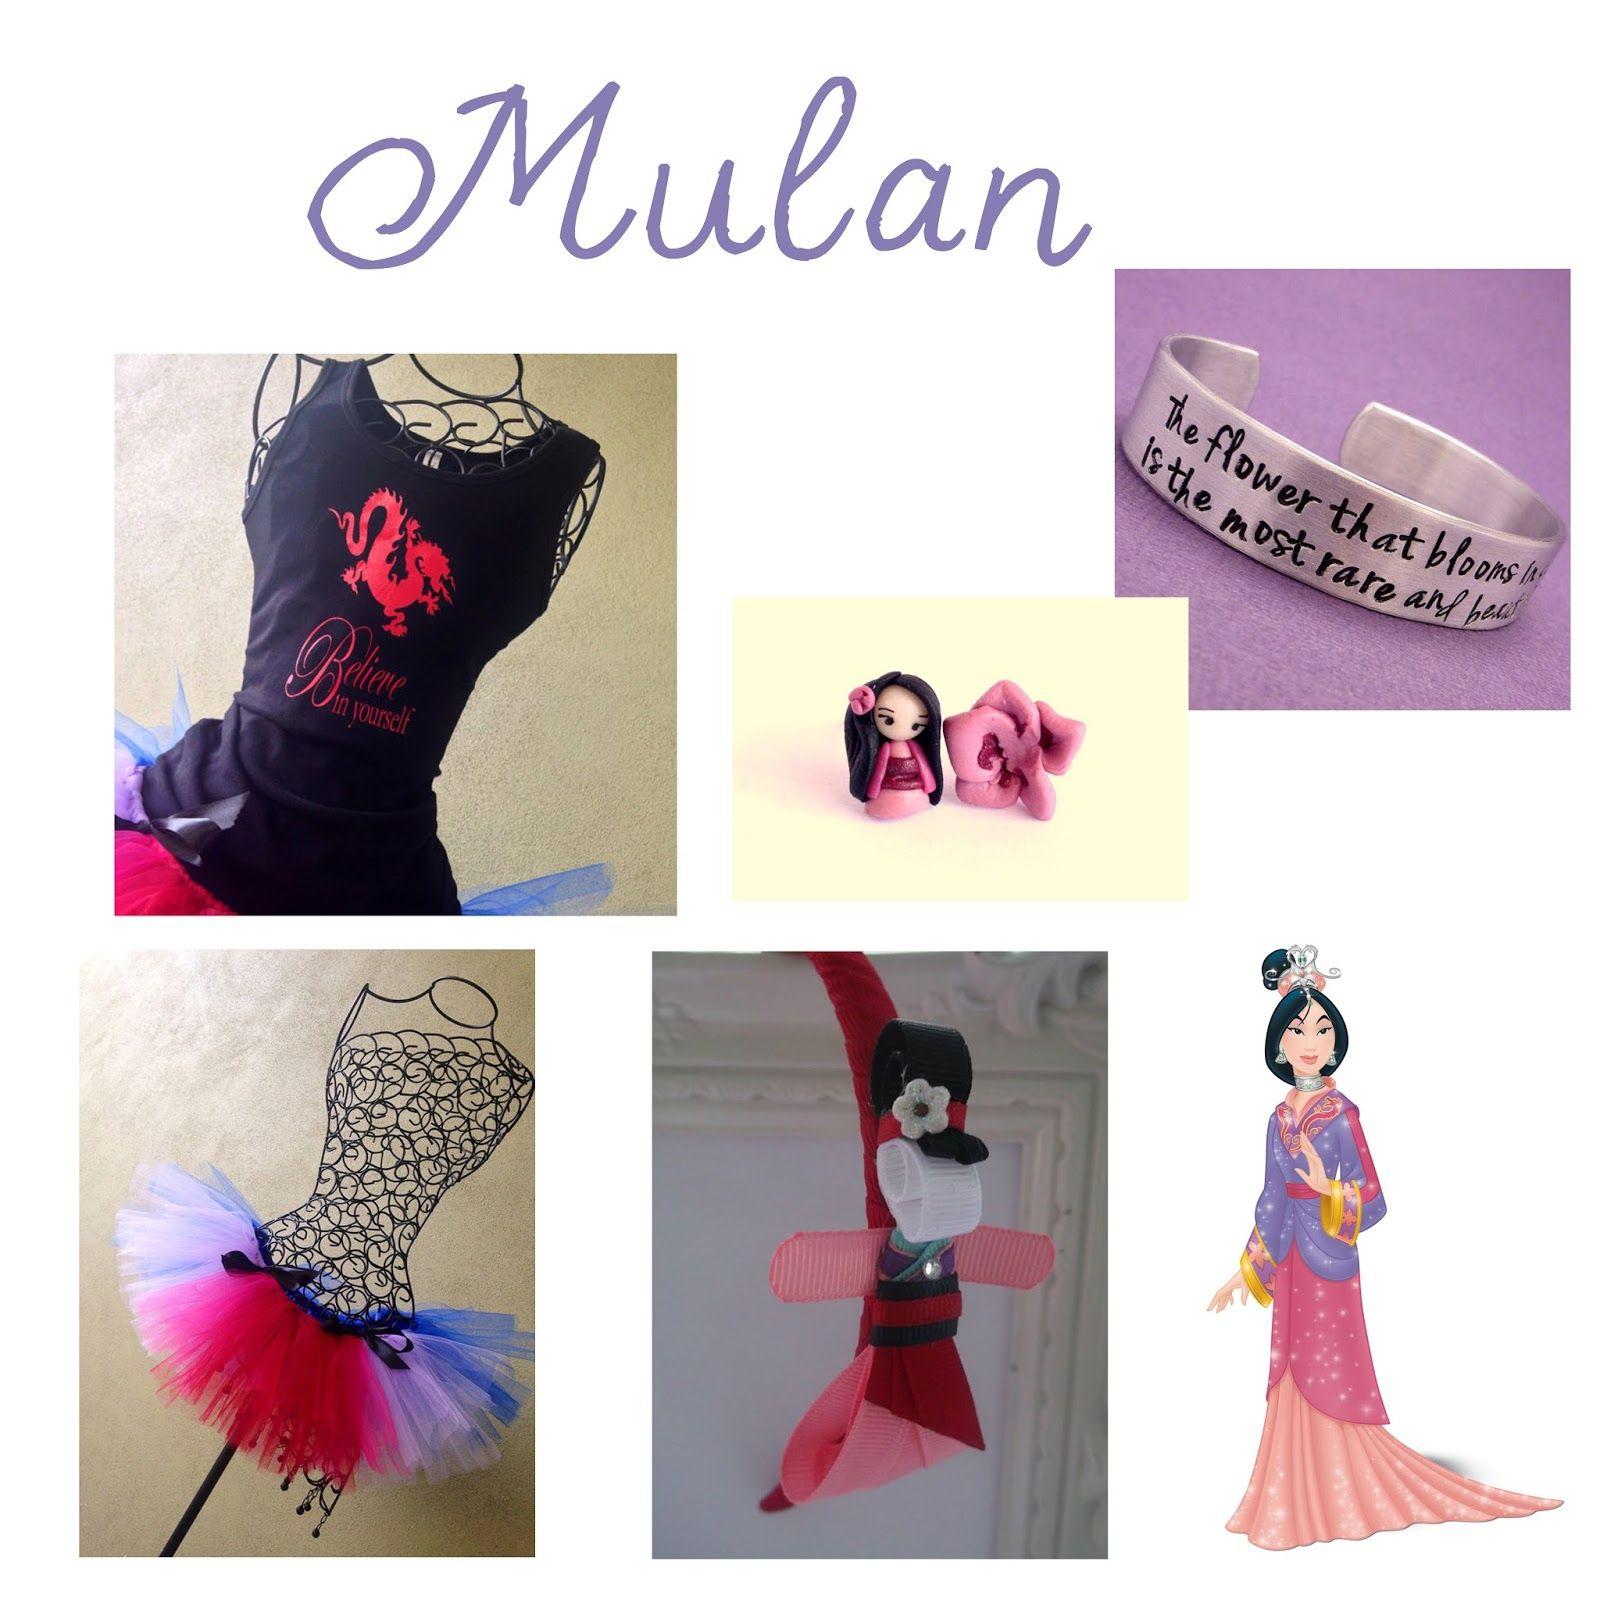 Run Disney Princess Mulan Costume Idea  sc 1 st  Pinterest & Run Disney Princess Mulan Costume Idea | BLOG: With Alabama Swagger ...